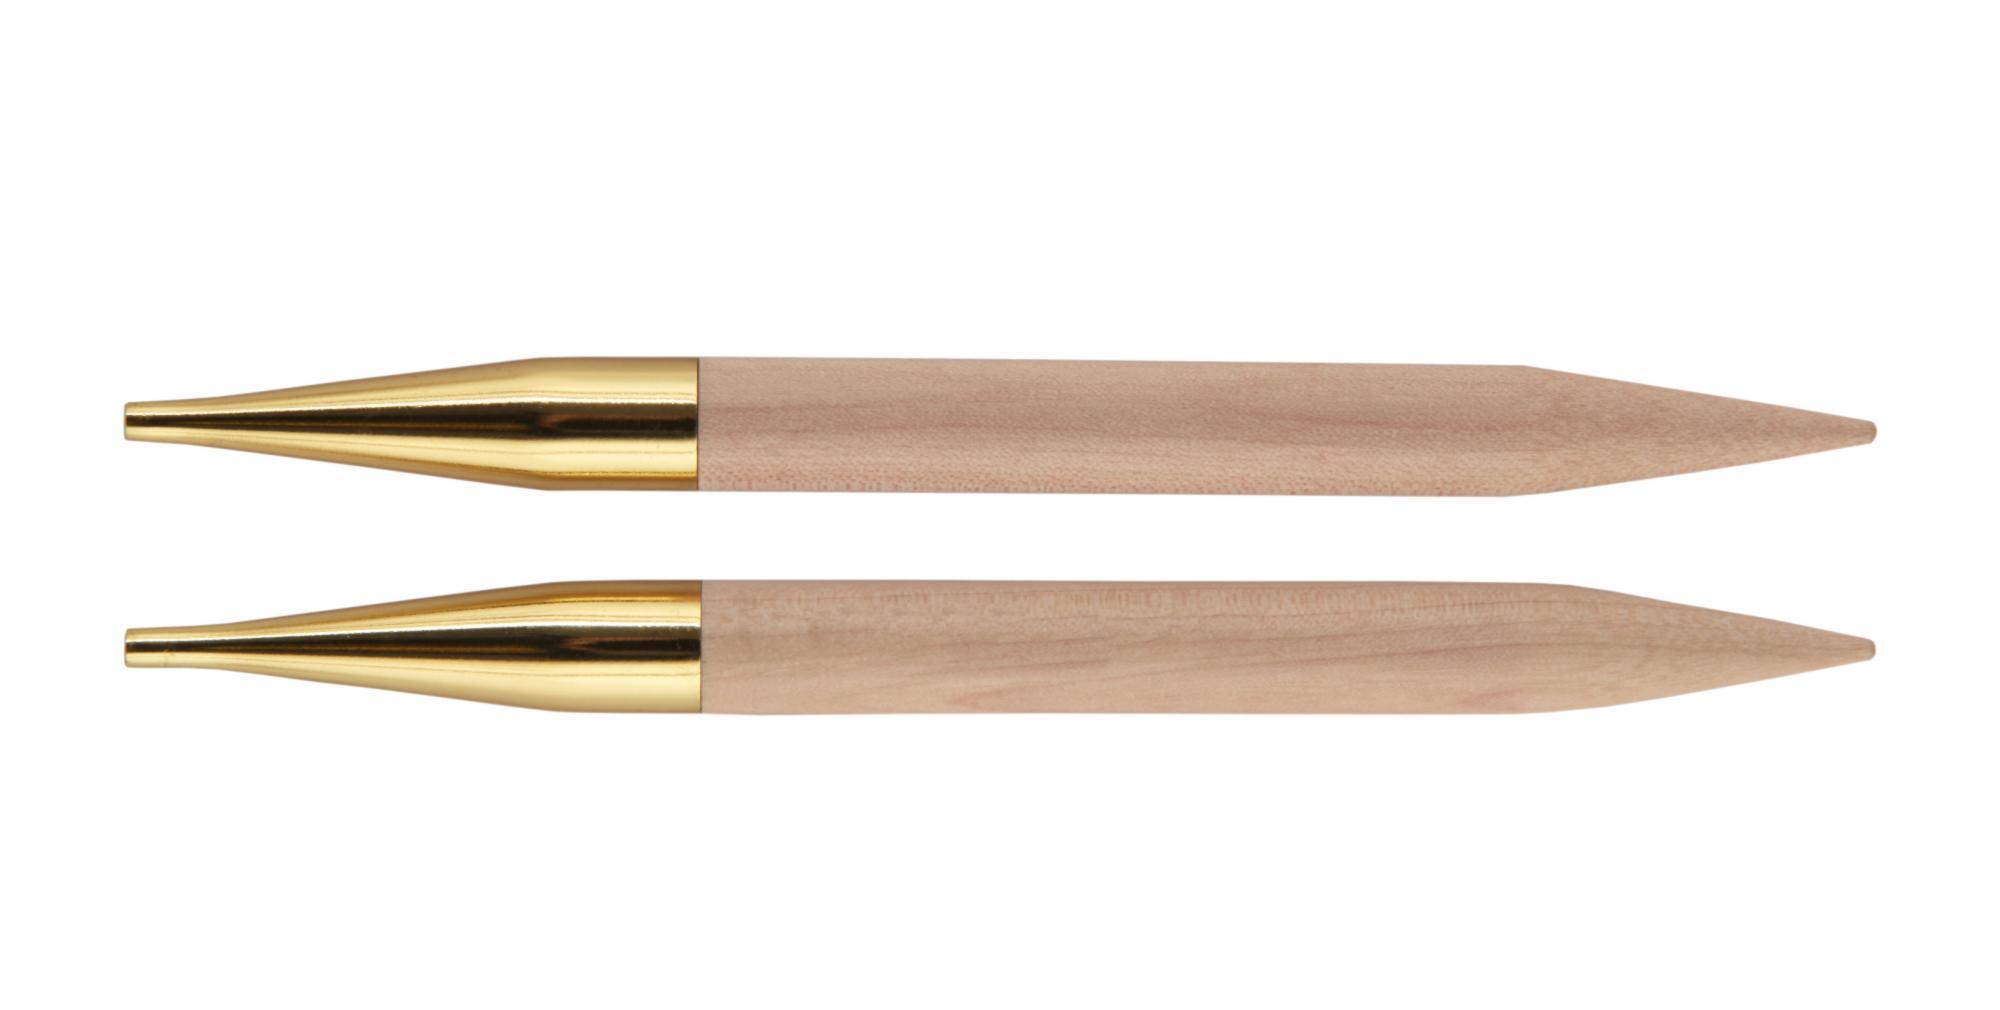 Спицы съемные Basix Birch Wood KnitPro, 35644, 10.00 мм